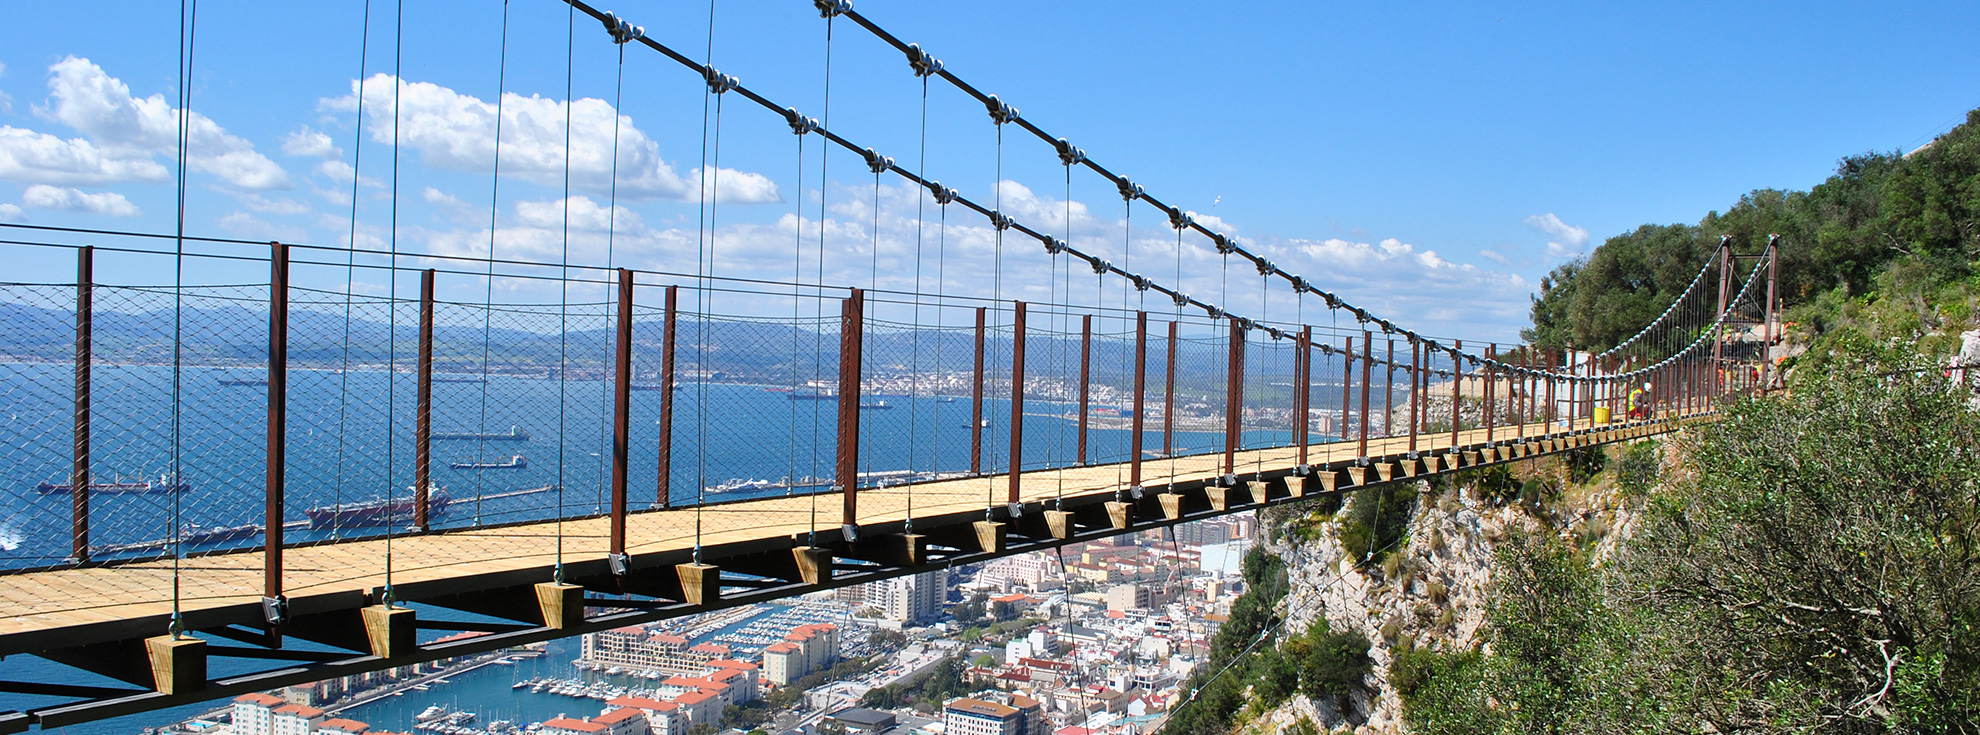 Windsor Suspended Bridge in Gibraltar, UK